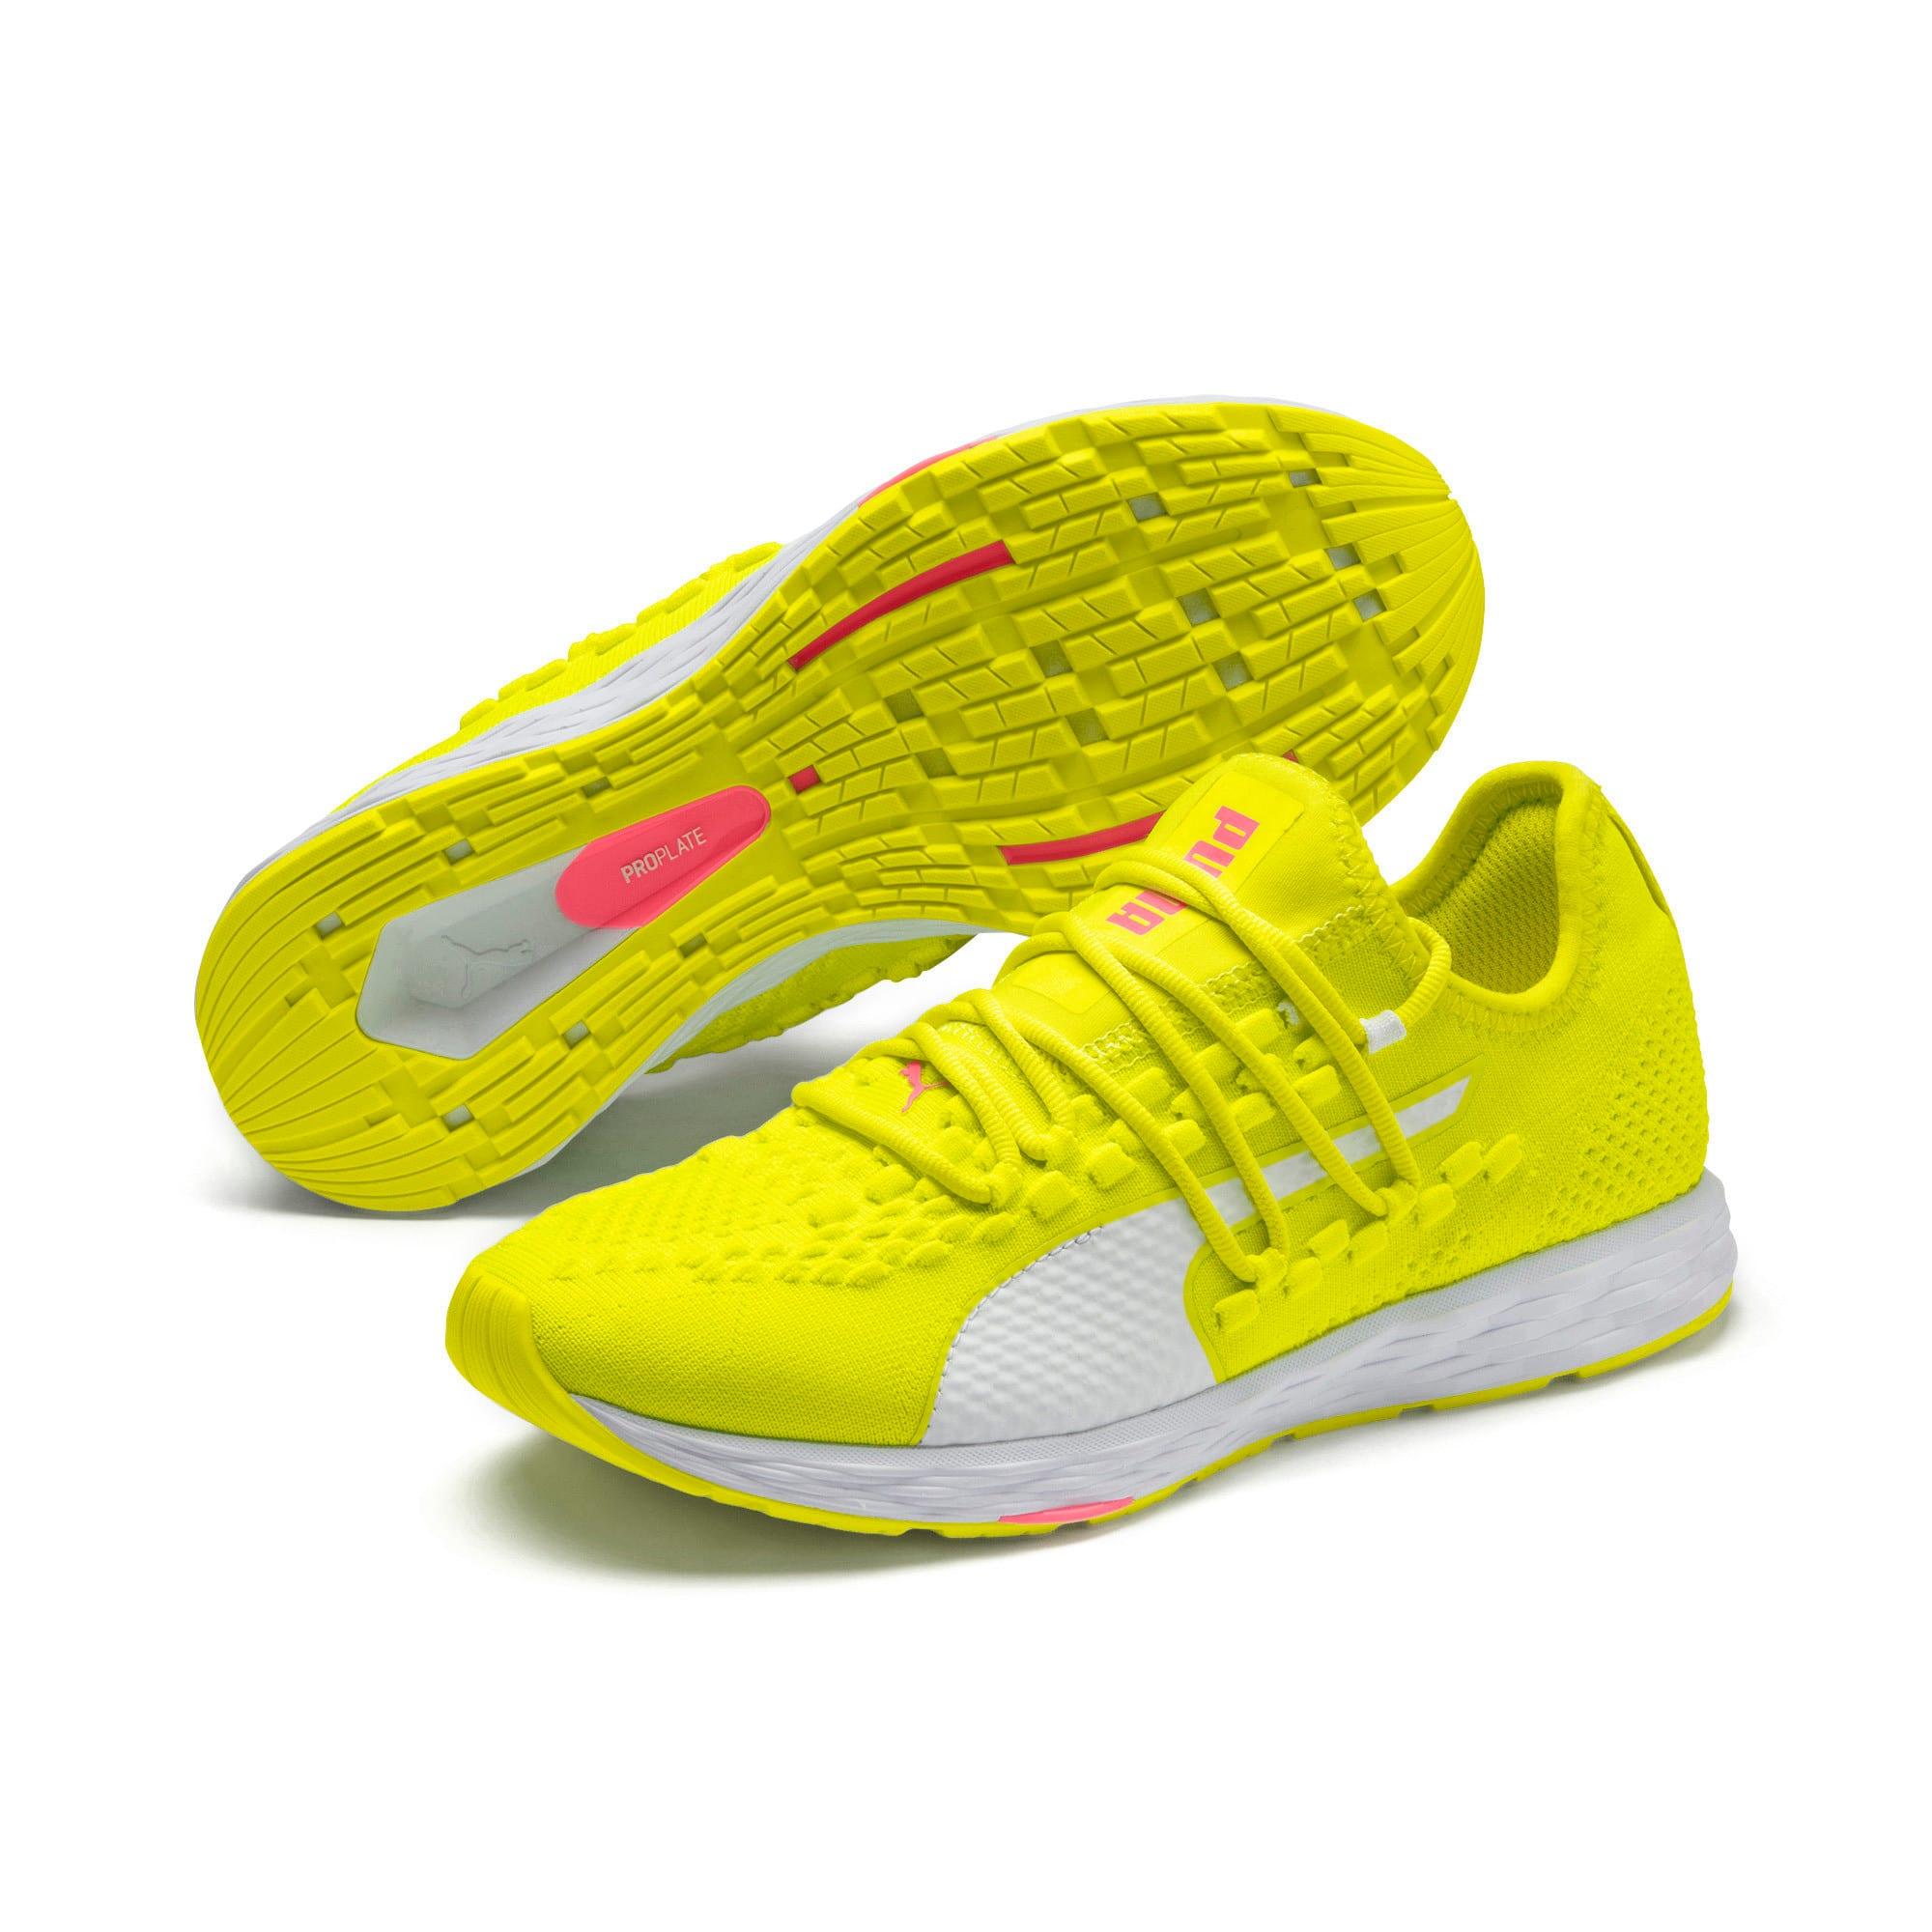 Thumbnail 4 of SPEED RACER Women's Running Shoes, Yellow-White-Pink Alert, medium-IND